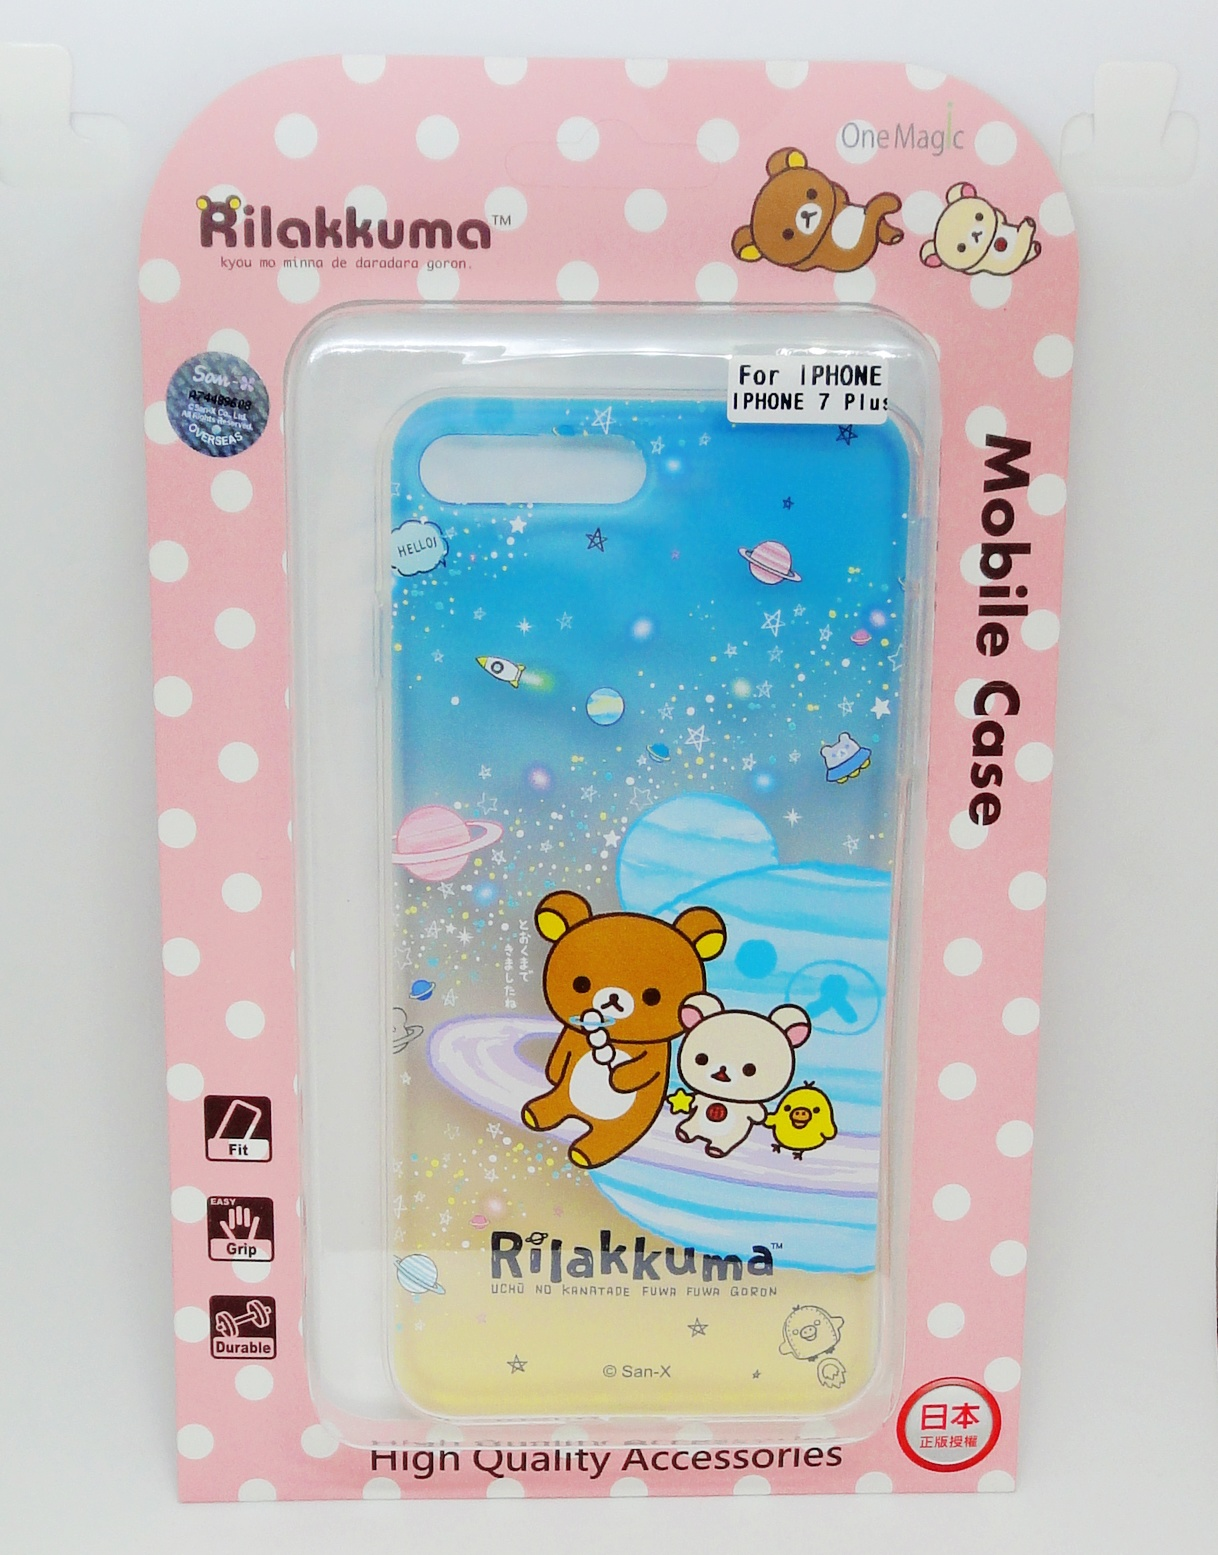 【UNIPRO】Apple iPhone7 PLUS 5.5吋星空拉拉熊 TPU 手機殼 San-X正版授權 i7+